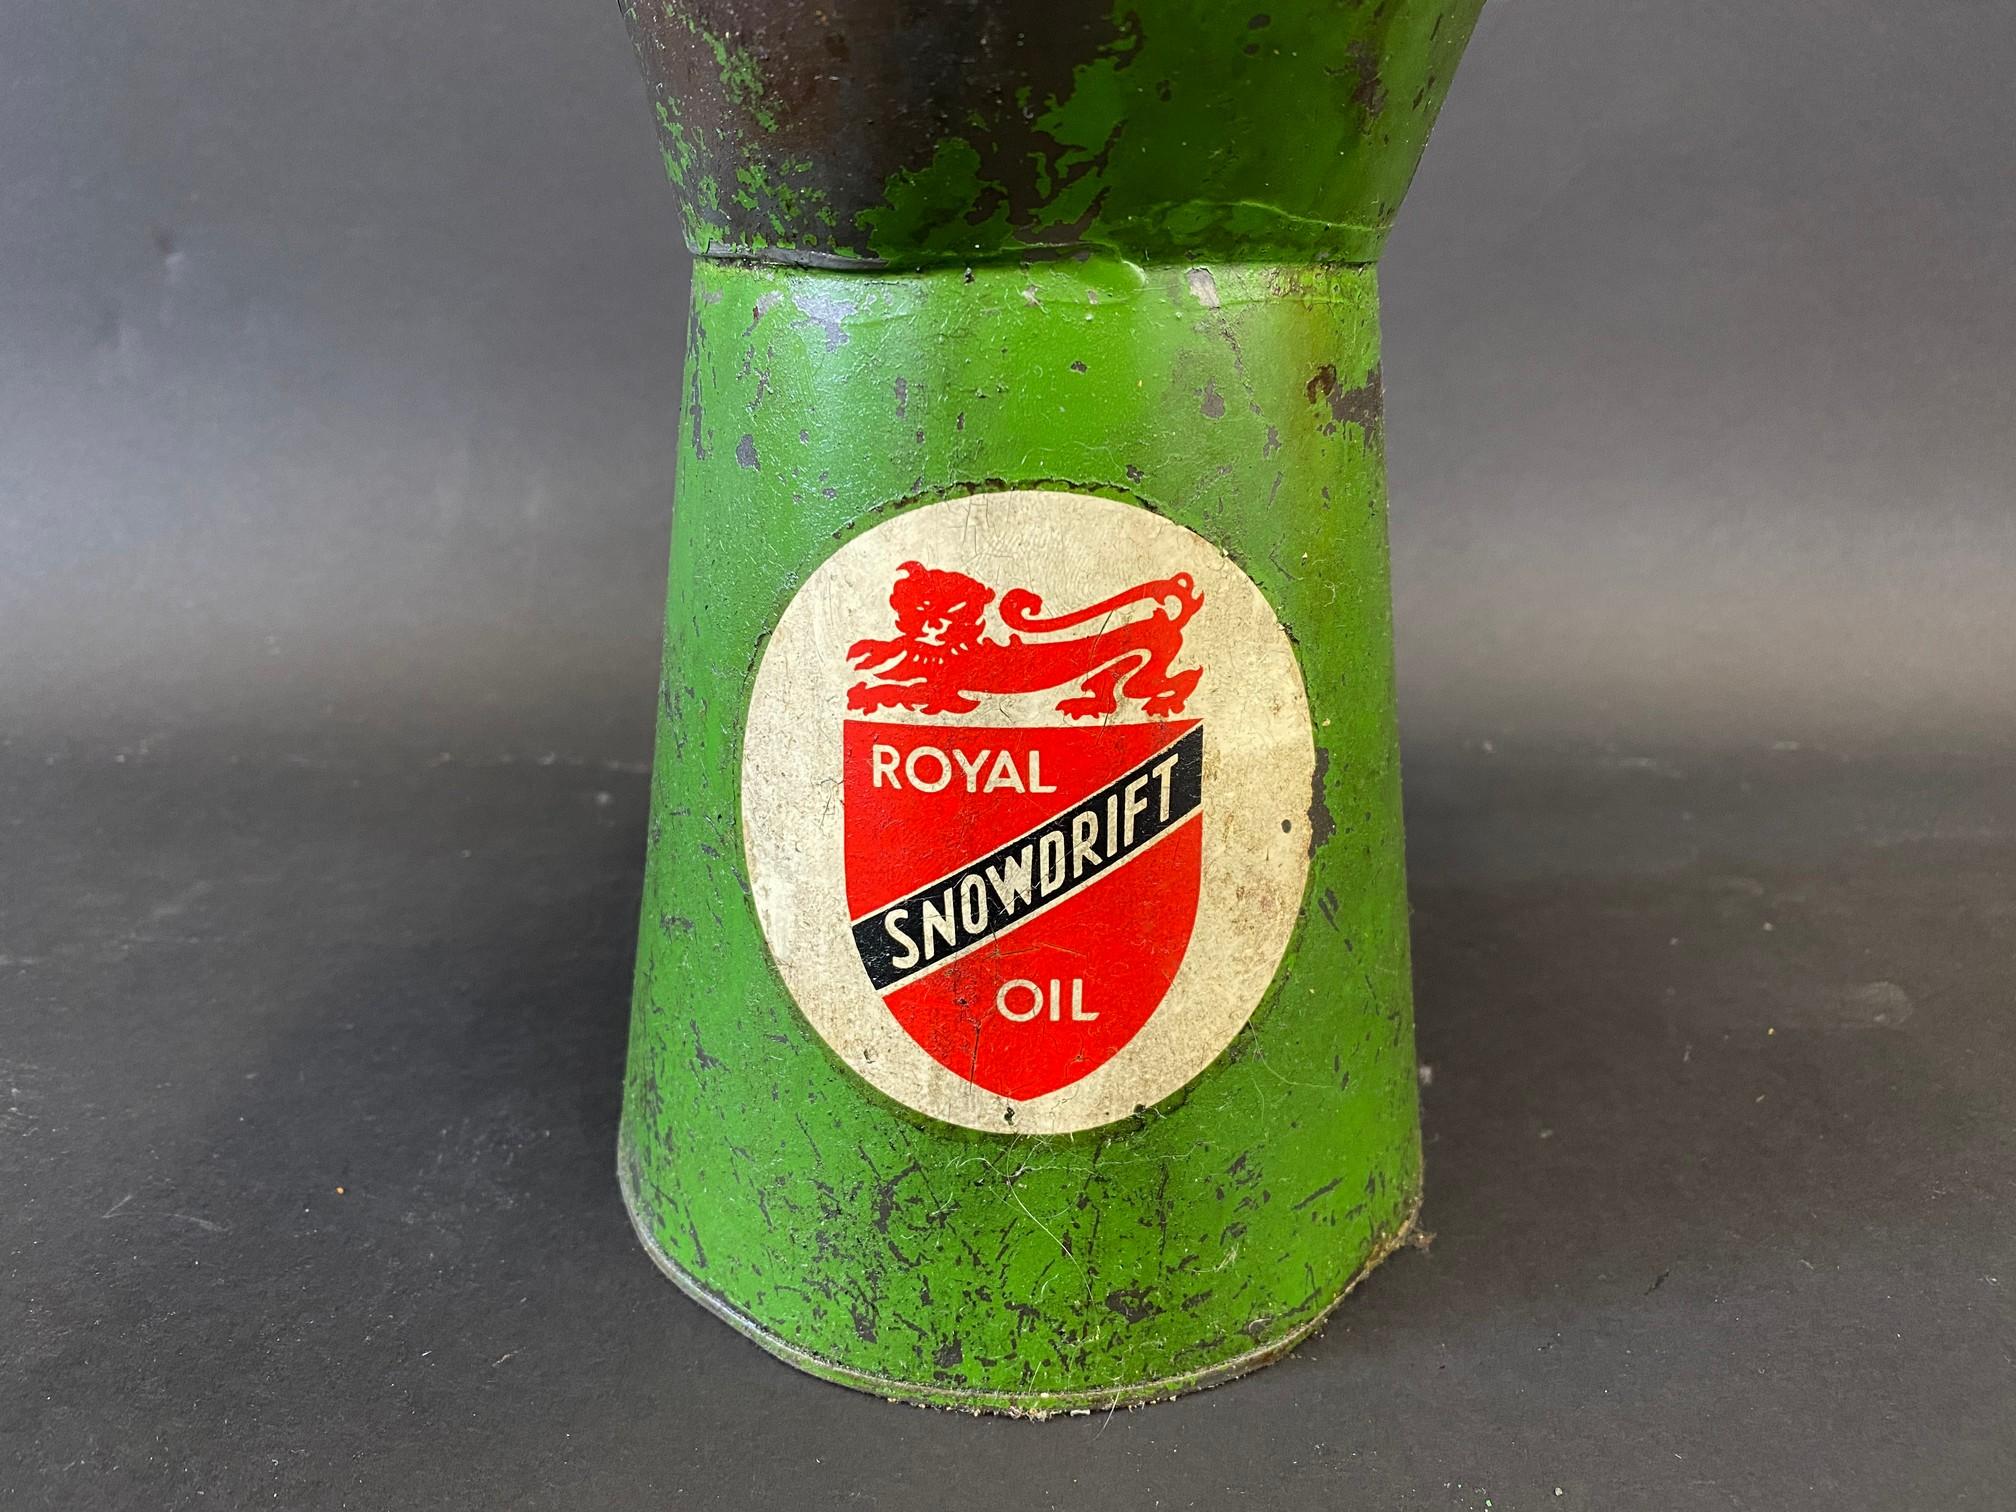 A Royal Snowdrift Oil quart measure. - Image 2 of 5